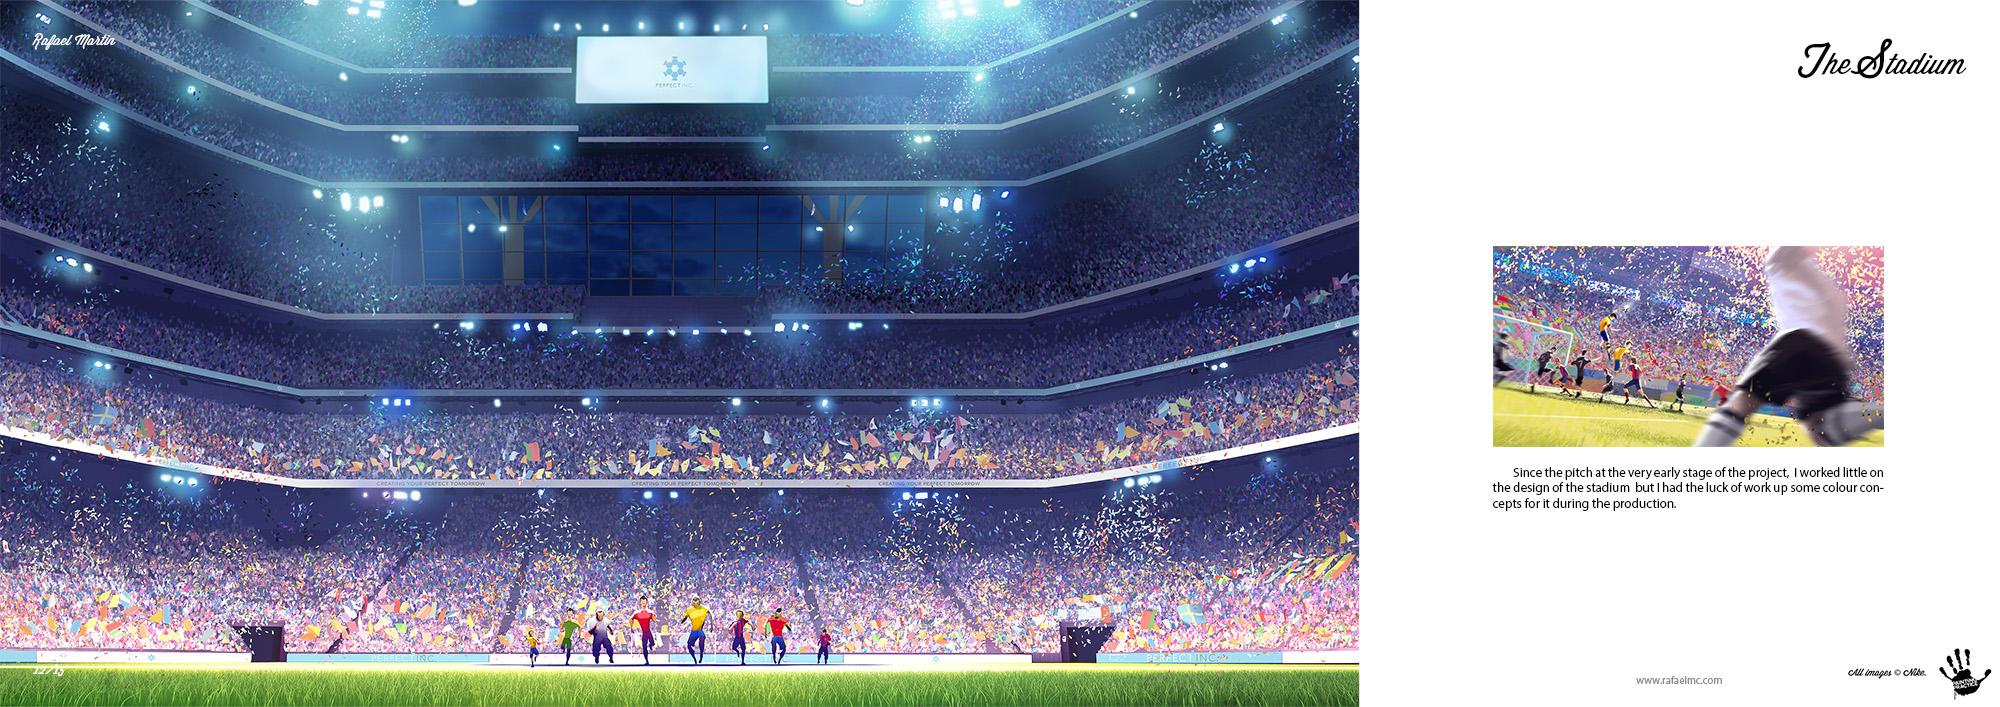 13_Stadium copy.jpg